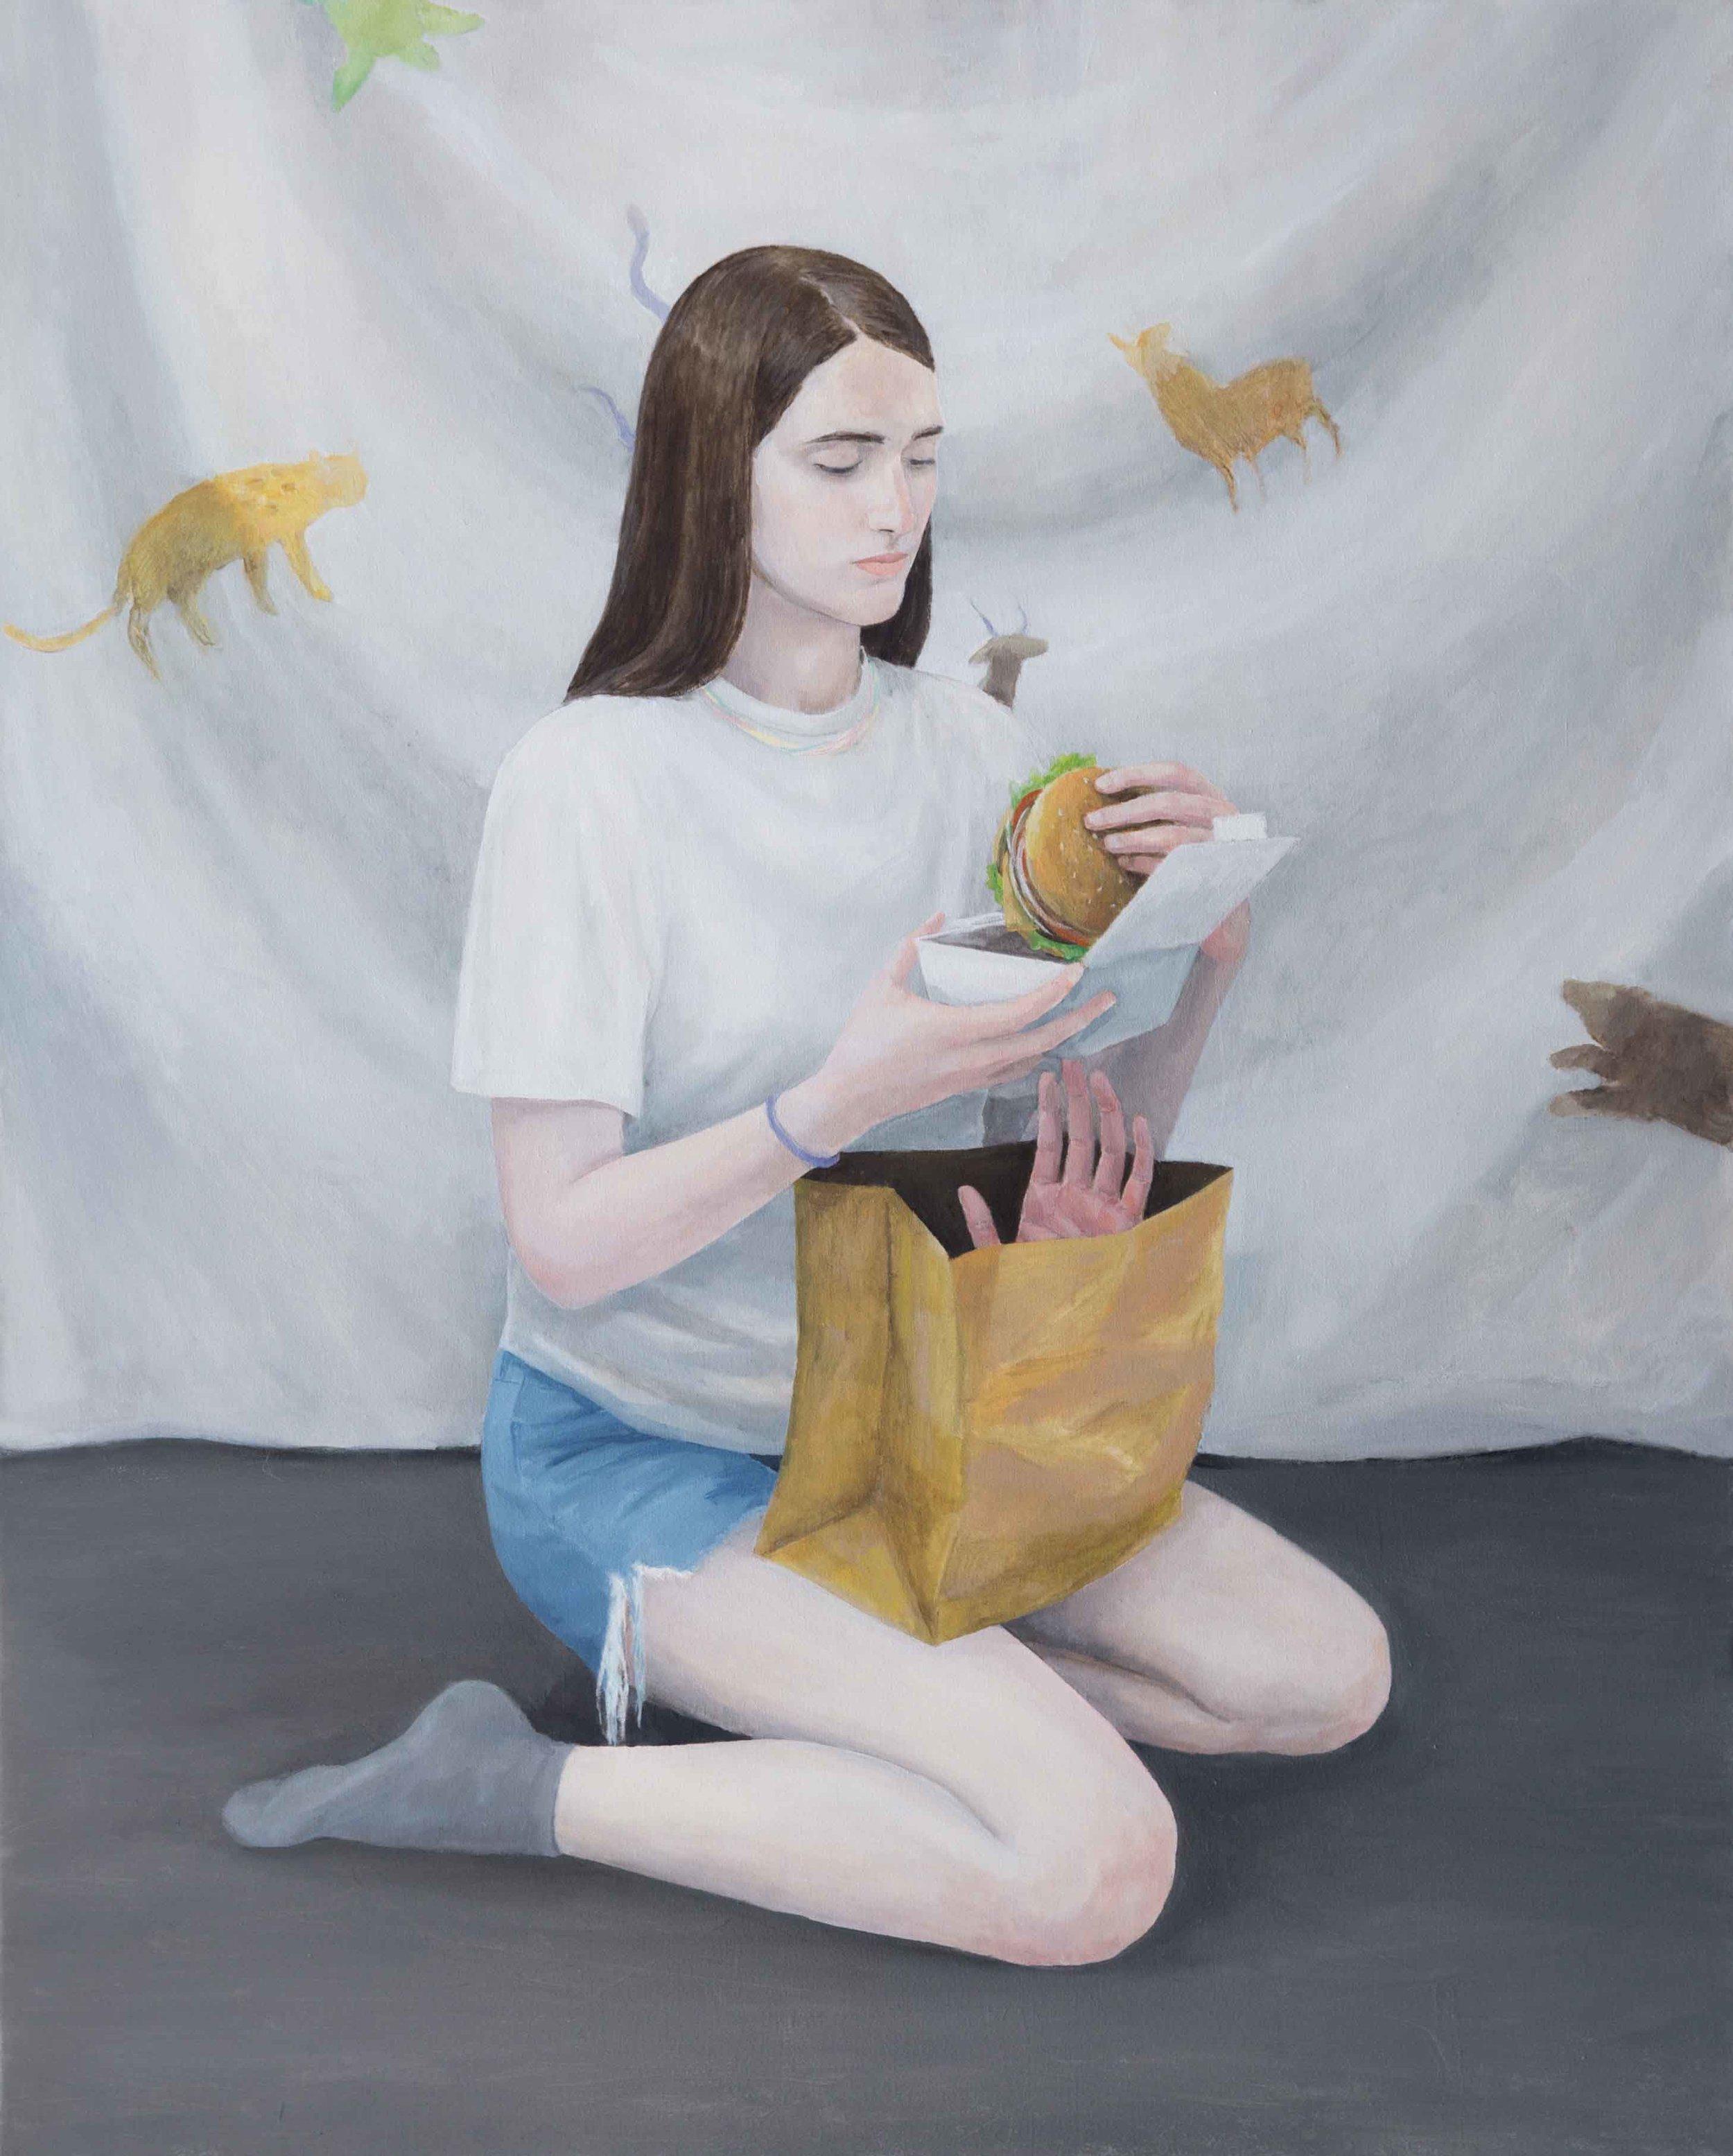 130x105cm, Oil on Canvas